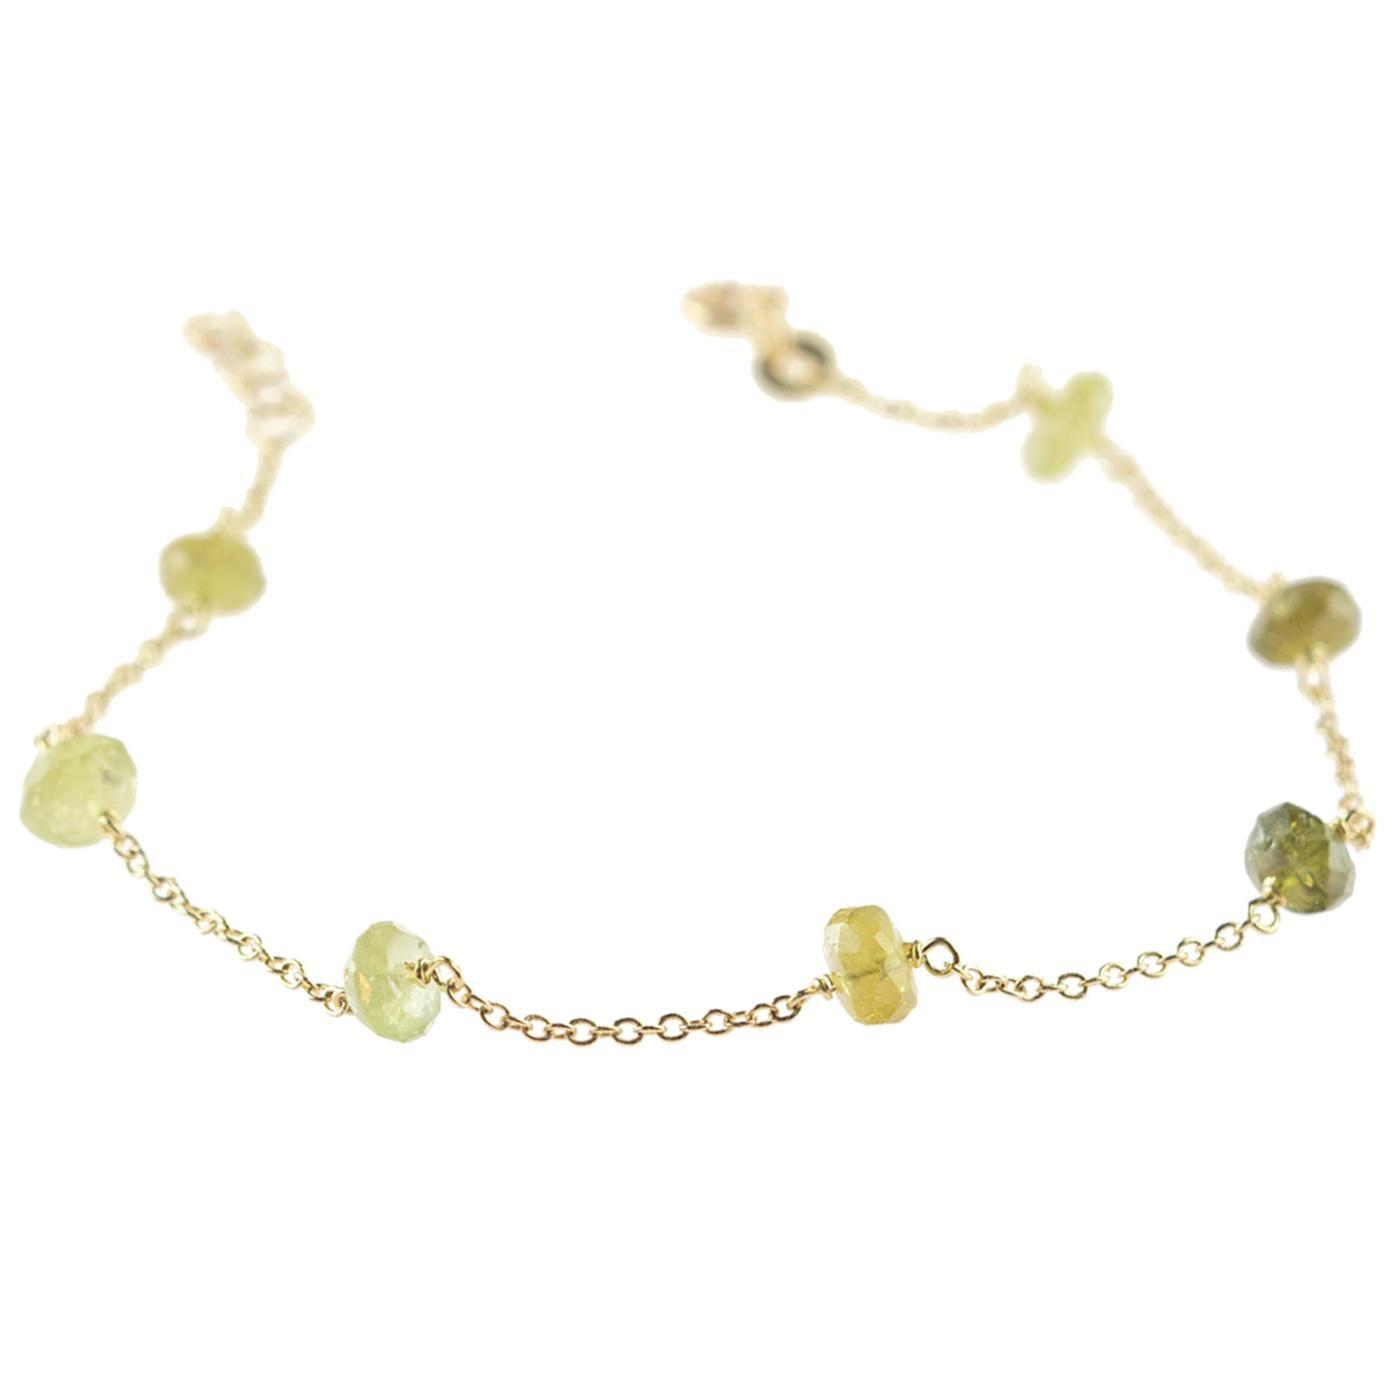 Intini Jewel Gold Plate Chain Green Tourmaline Rondelle Handmade Anklet Bracelet